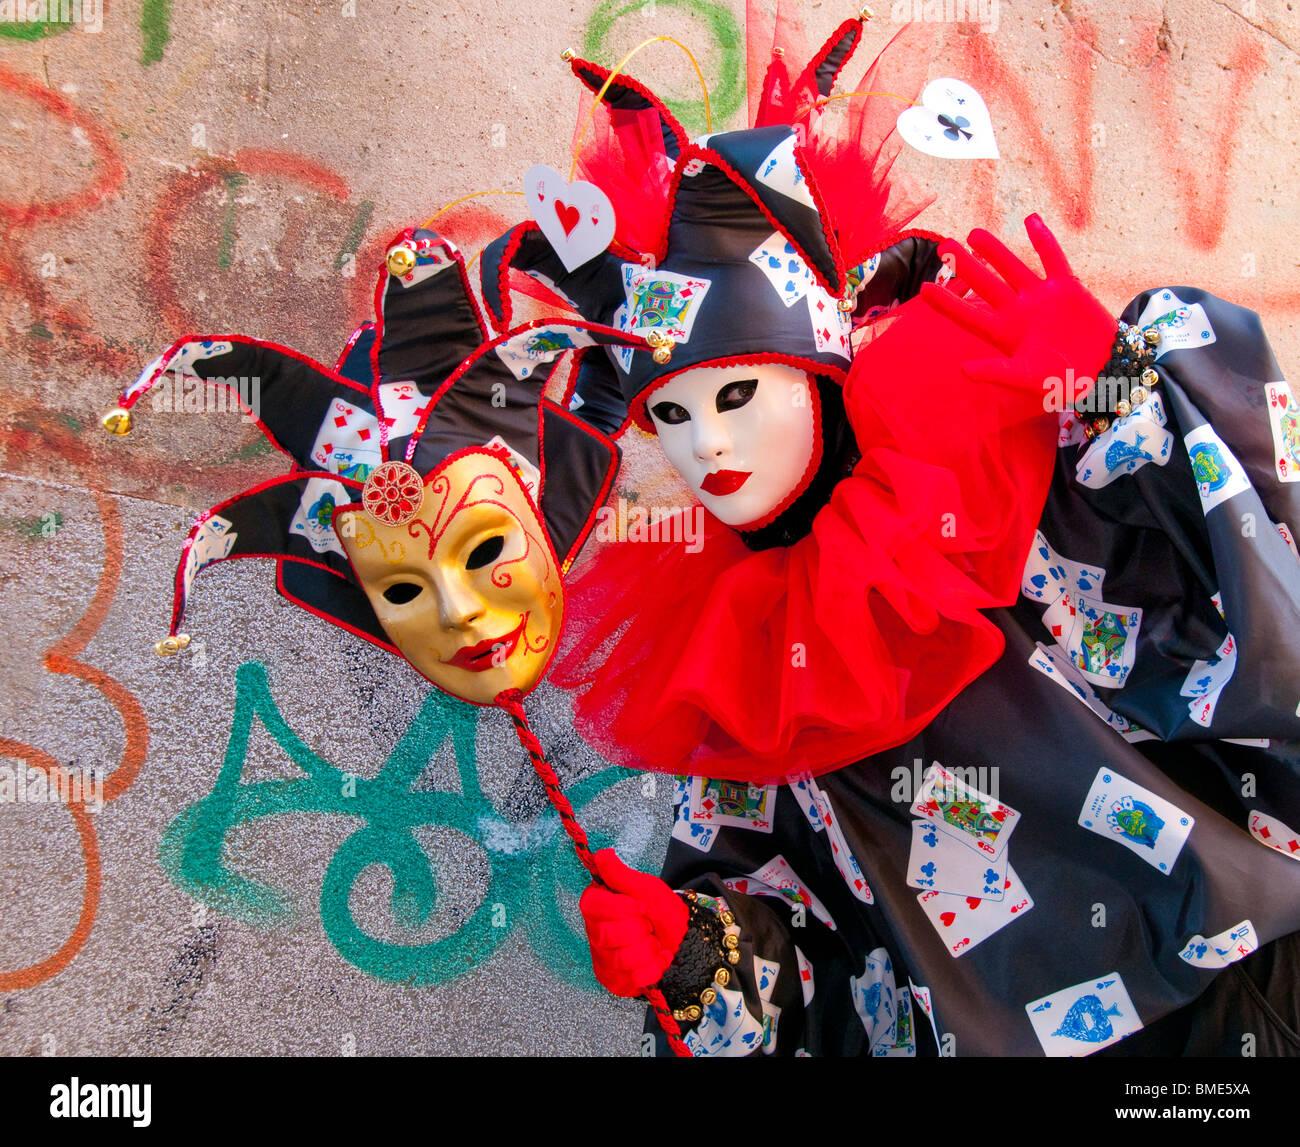 karneval in venedig italien kost mierten narren teilnehmer stockfoto bild 29815474 alamy. Black Bedroom Furniture Sets. Home Design Ideas